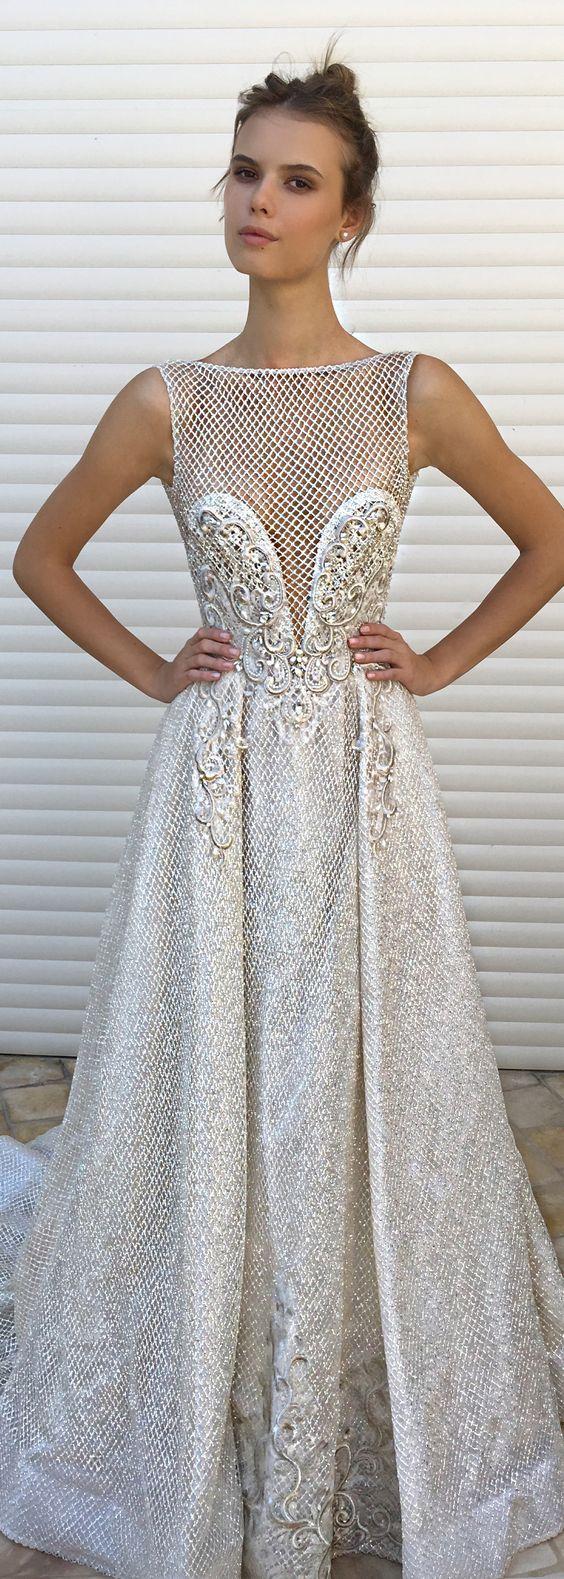 Berta Bridal Fall Wedding Dresses 2017 / http://www.deerpearlflowers.com/berta-fw-2017-wedding-dresses/2/